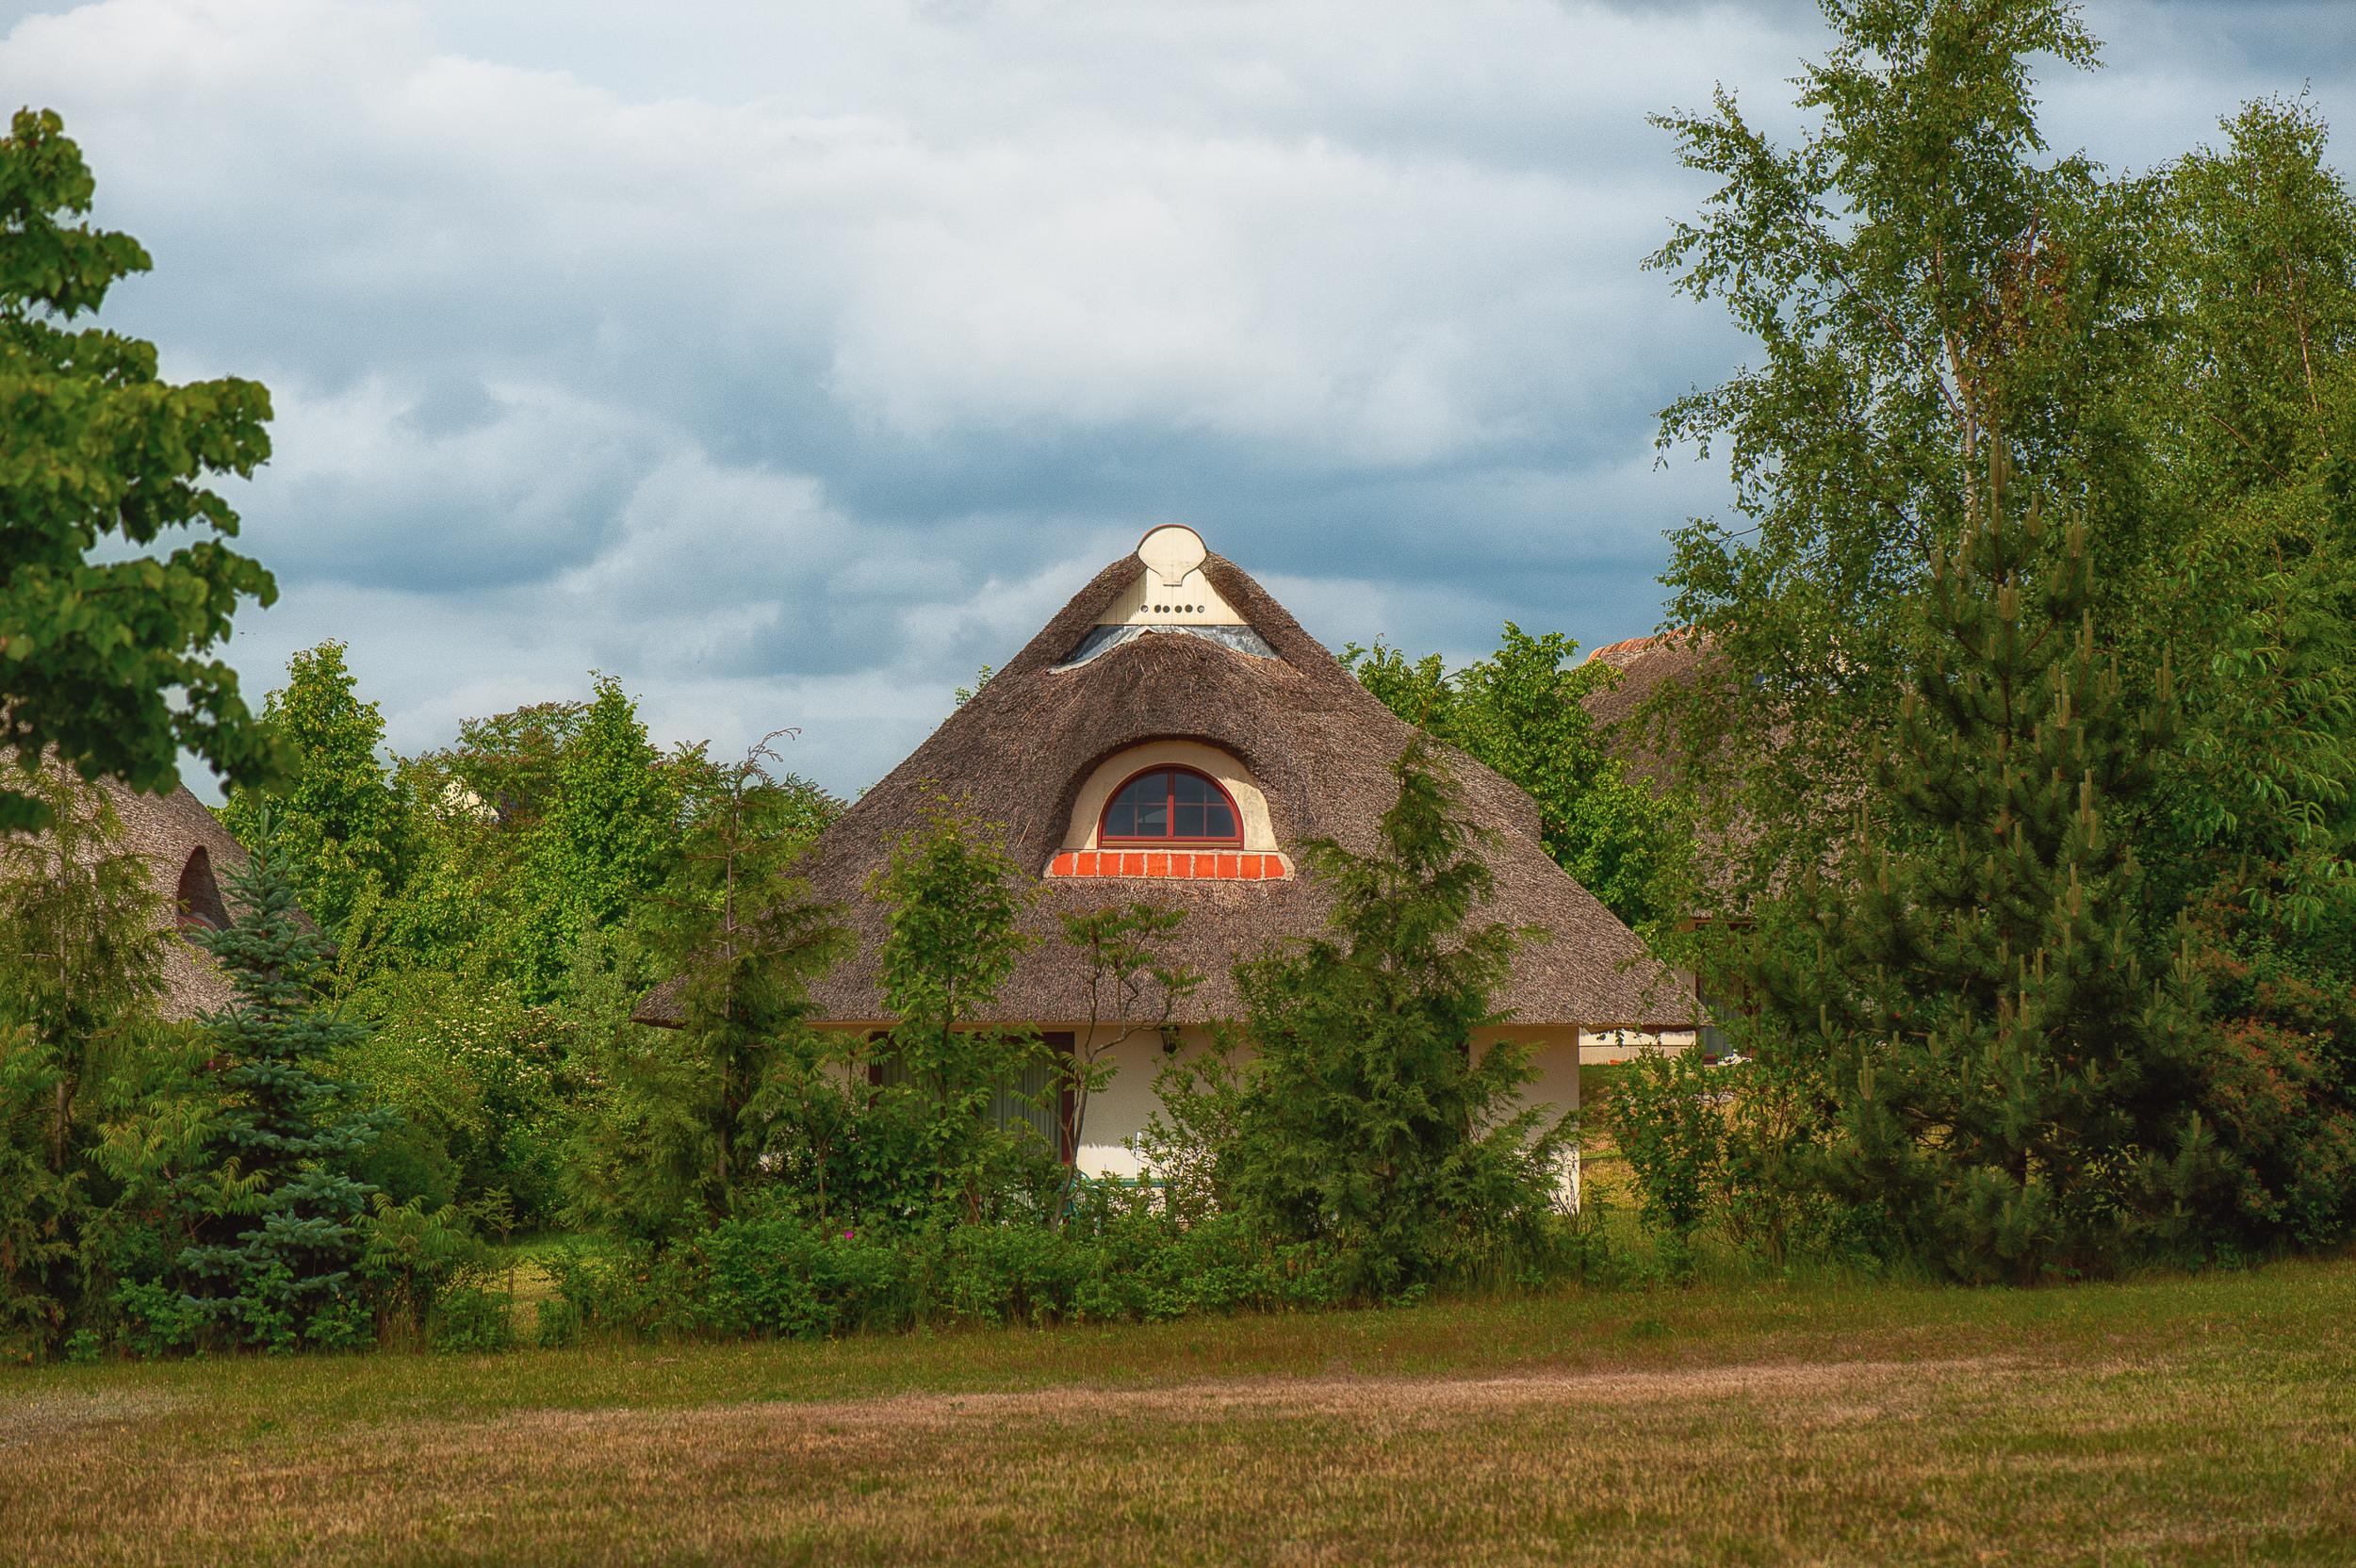 Van_der_Valk_Resort_Linstow_20120614_0549-Edit-2.jpg